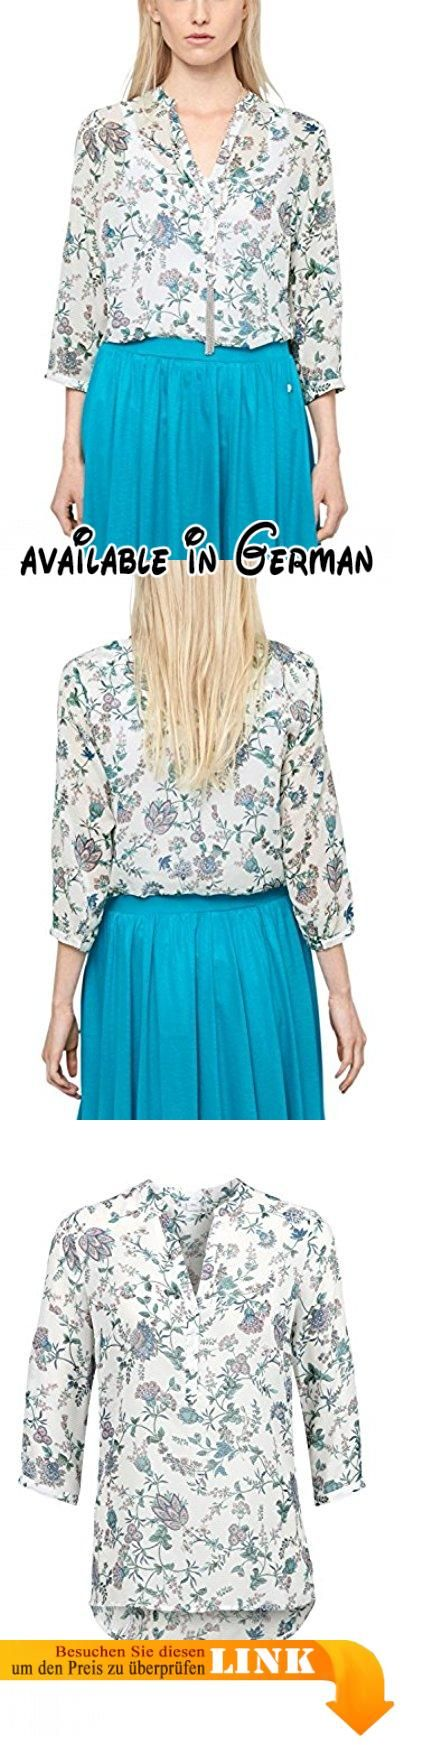 s.Oliver Damen Regular Fit Bluse mit Alloverprint 14.506.19.7809, Gr. 40, Mehrfarbig (creme floral print 02C1). Top modische , feminine 3/4 Arm  Bluse mit tollem rundum Muster #Apparel #SHIRT